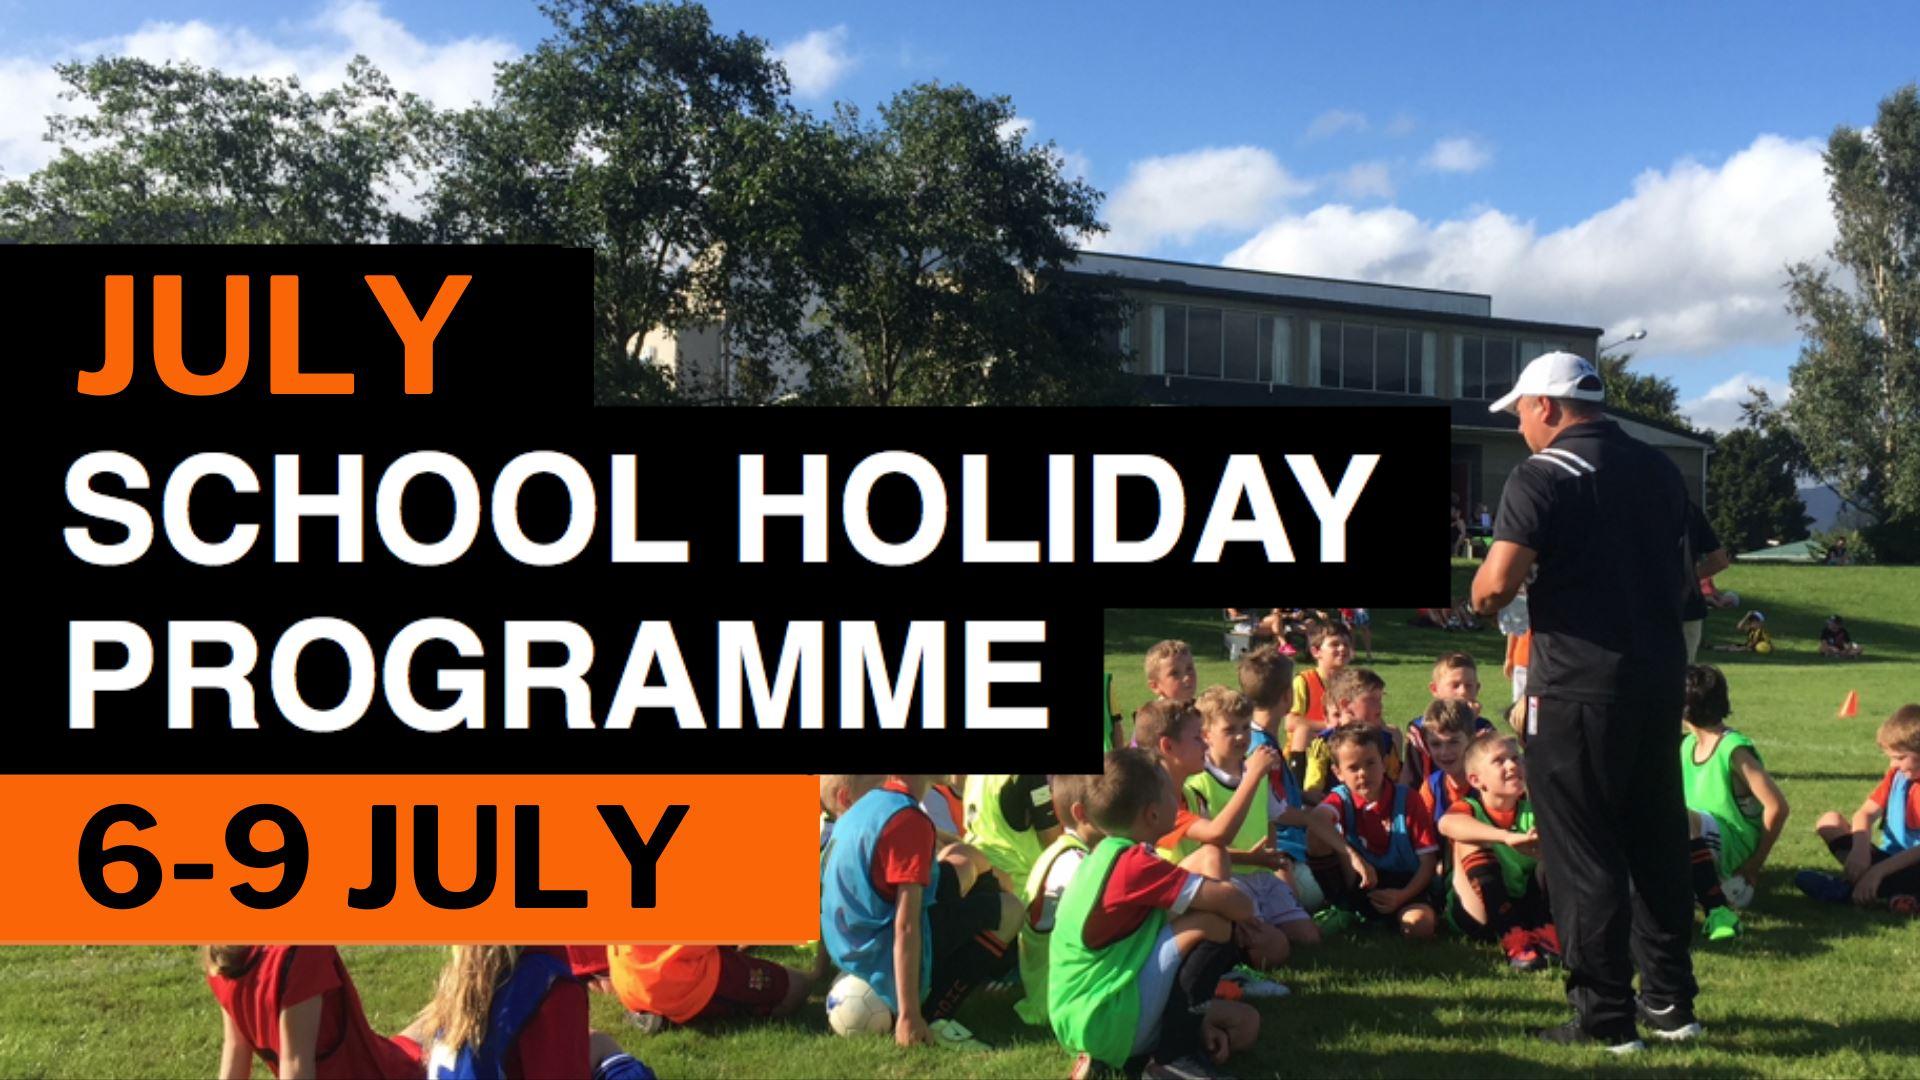 July School Holiday Programme